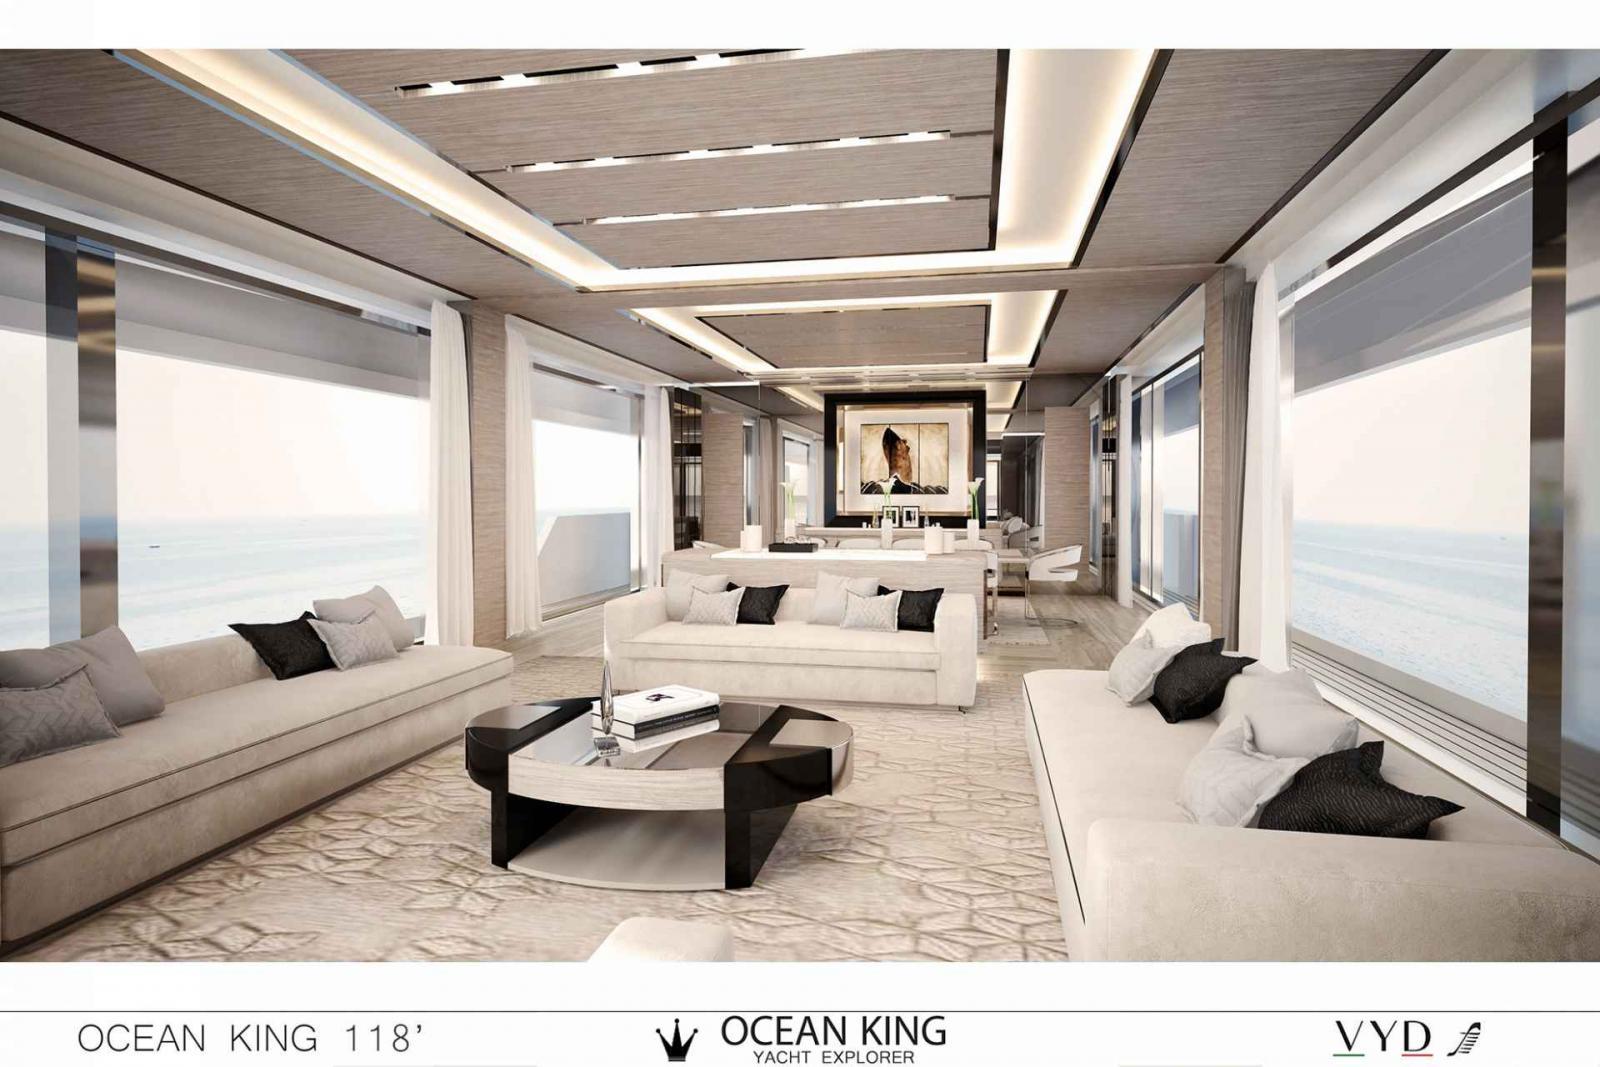 Ocean King Classic 108